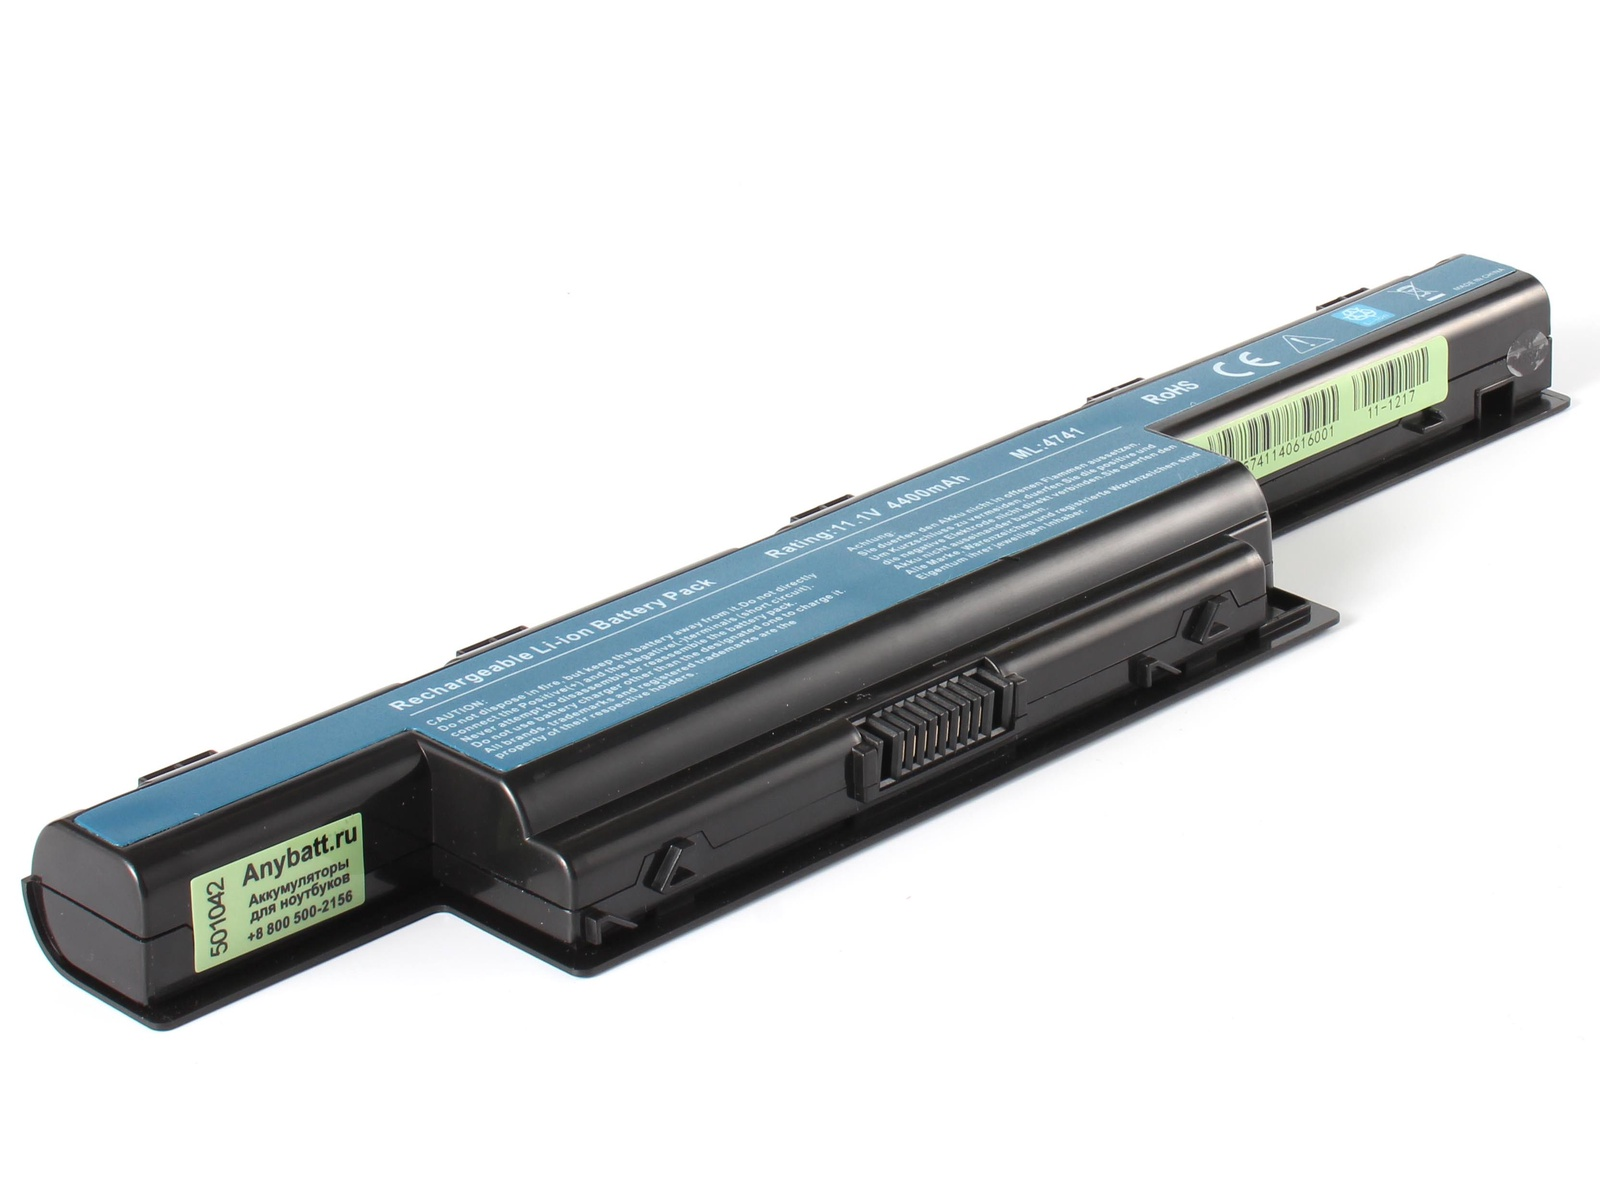 Аккумулятор для ноутбука AnyBatt для Packard Bell EasyNote TE11HC-B9702G32Mnks, EasyNote TS11-SB-883, EasyNote TV43HC-53238G75Mnrr, EasyNote TE11 AMD, EasyNote TM94, EasyNote LV11HC-B9704G50Mnks, EasyNote TS11 Intel mymei outdoor 90db ring alarm loud horn aluminum bicycle bike safety handlebar bell